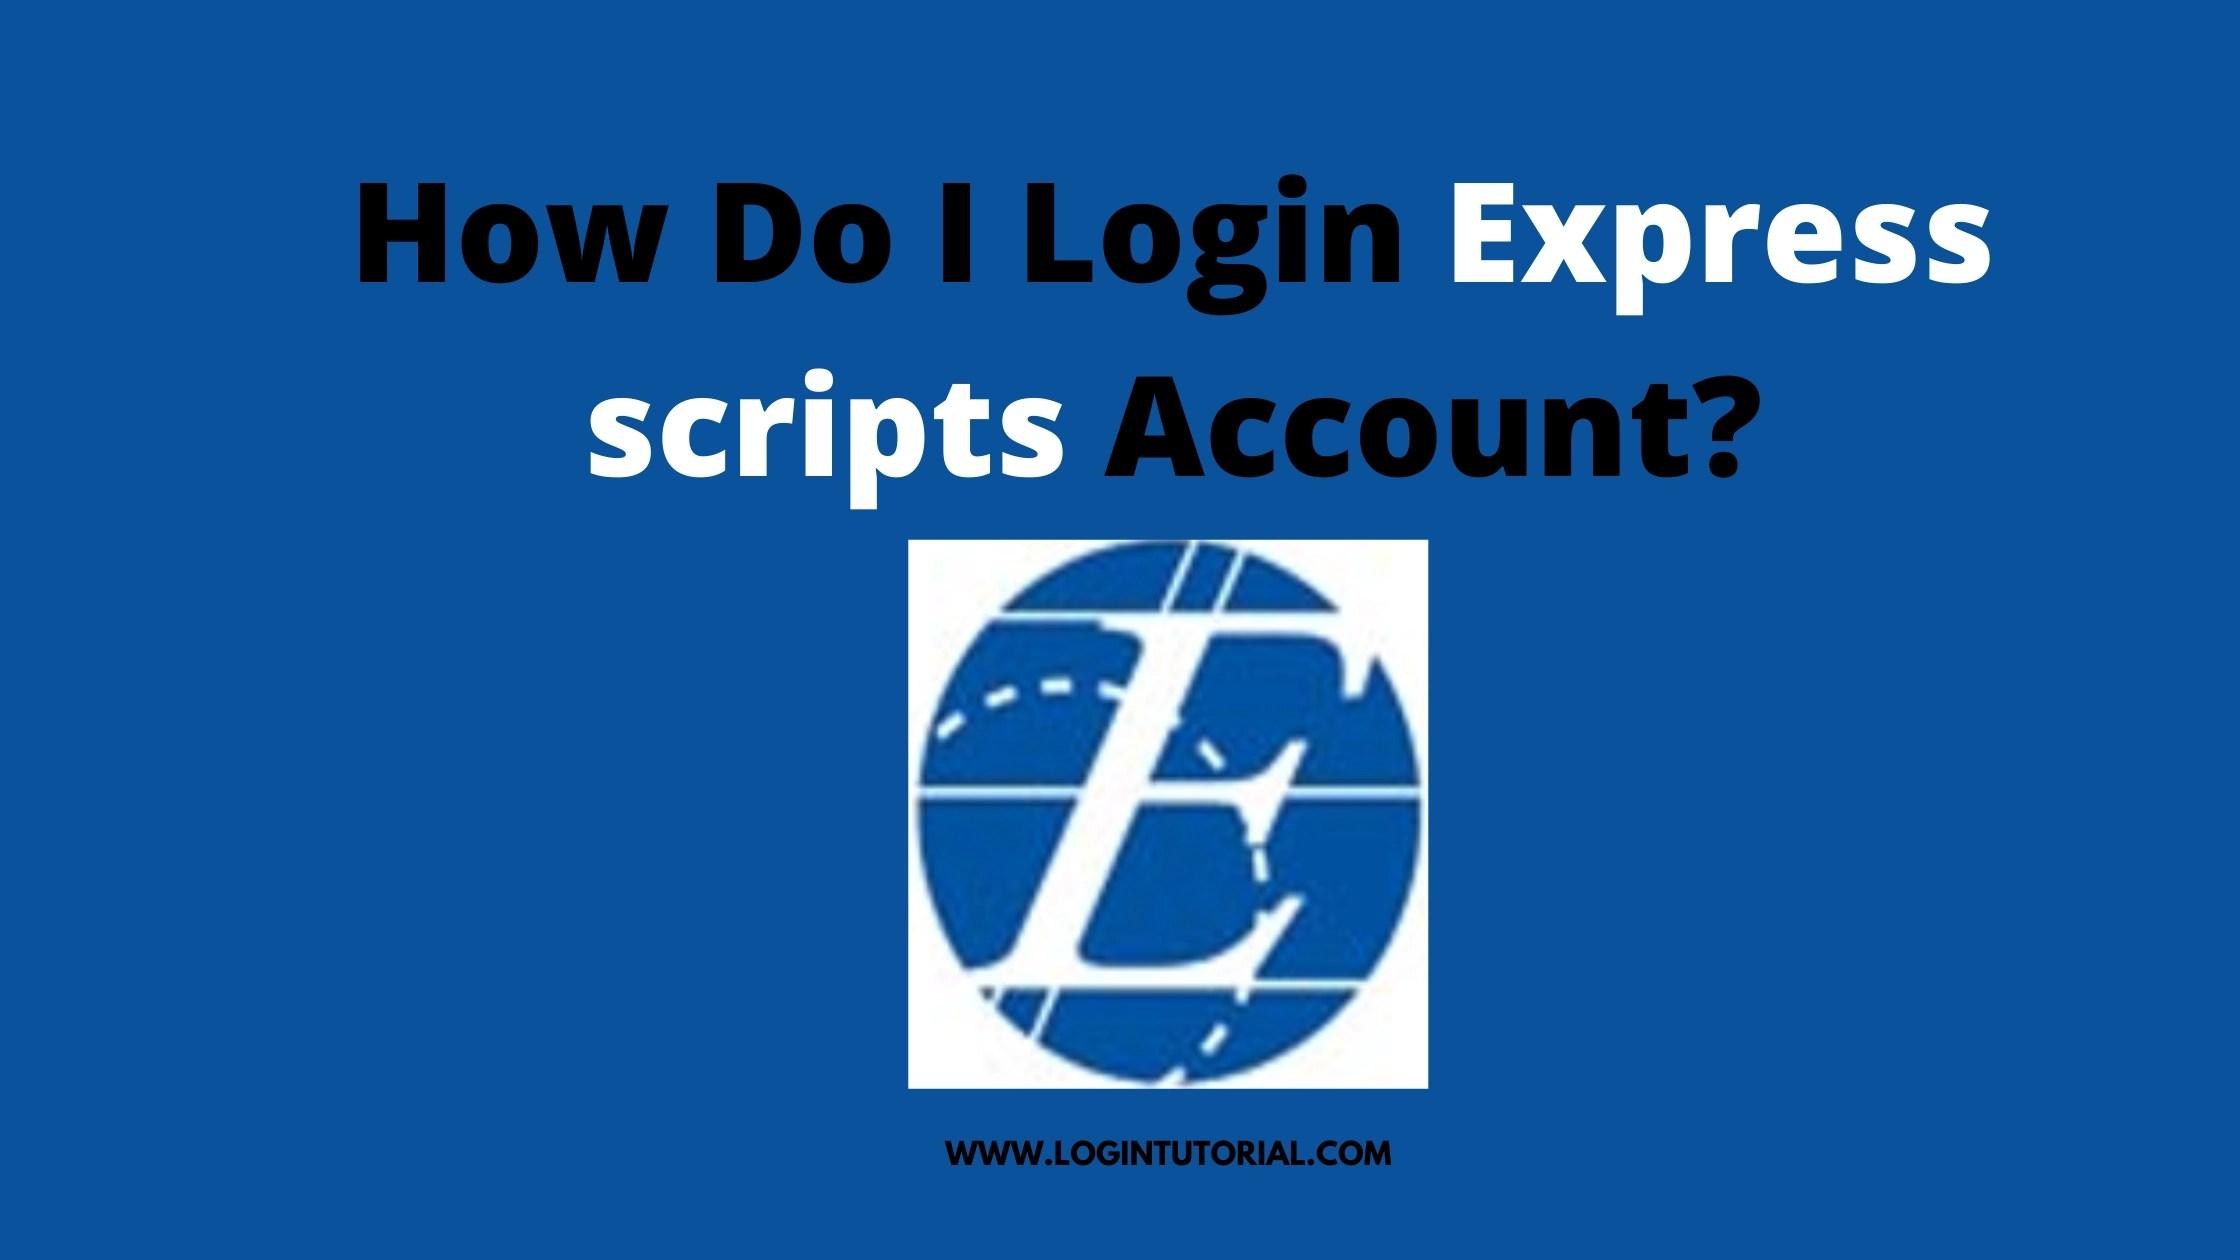 Express scripts login